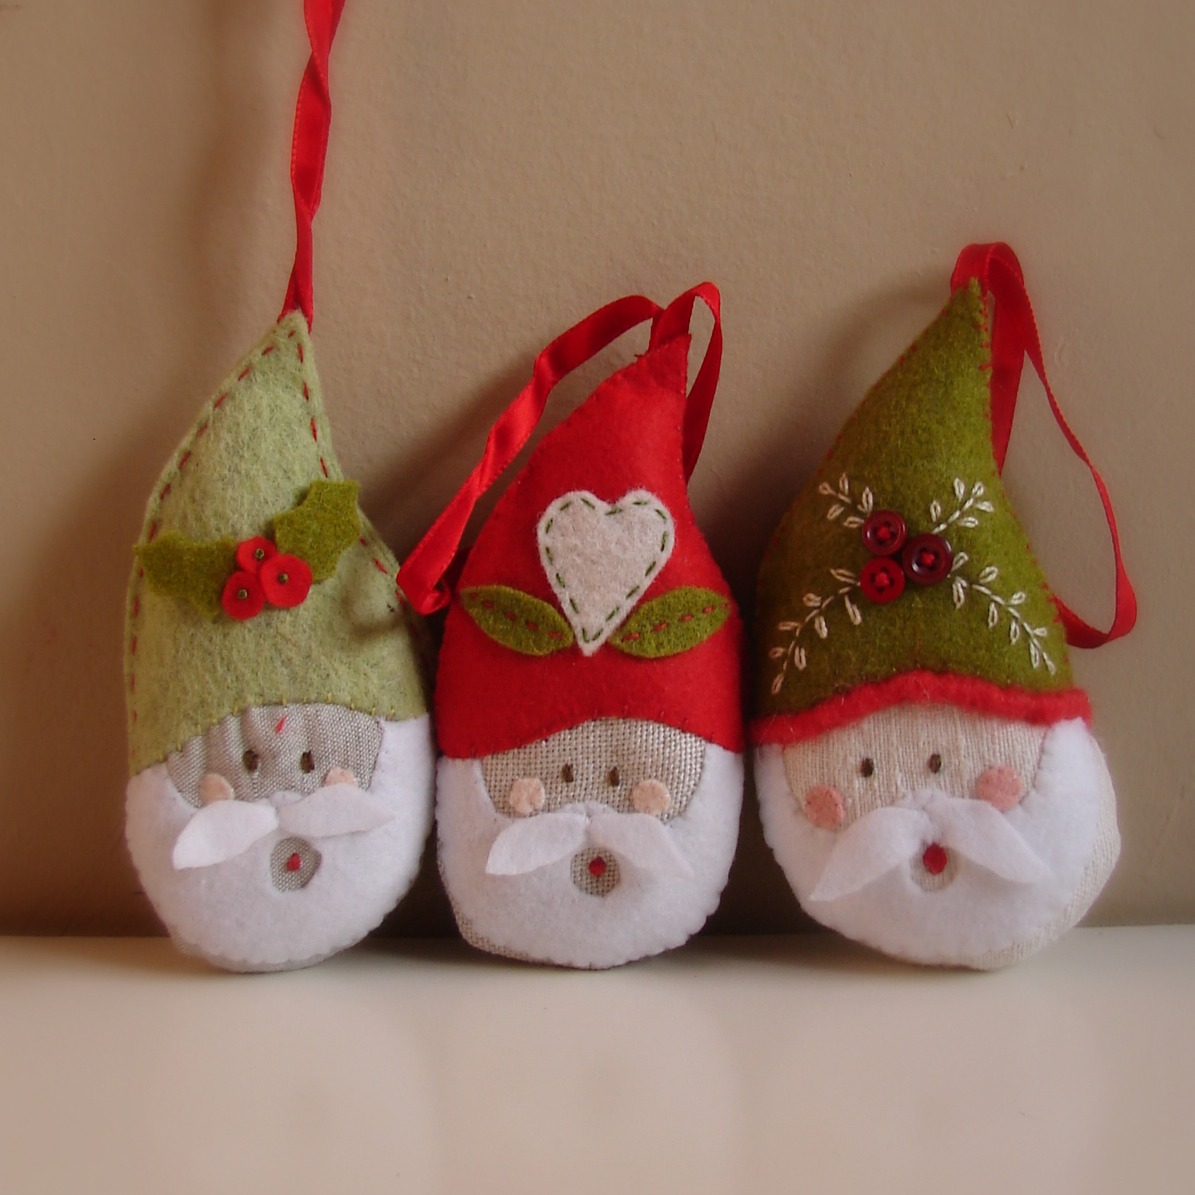 Felt christmas ornament patterns for Christmas ornament ideas